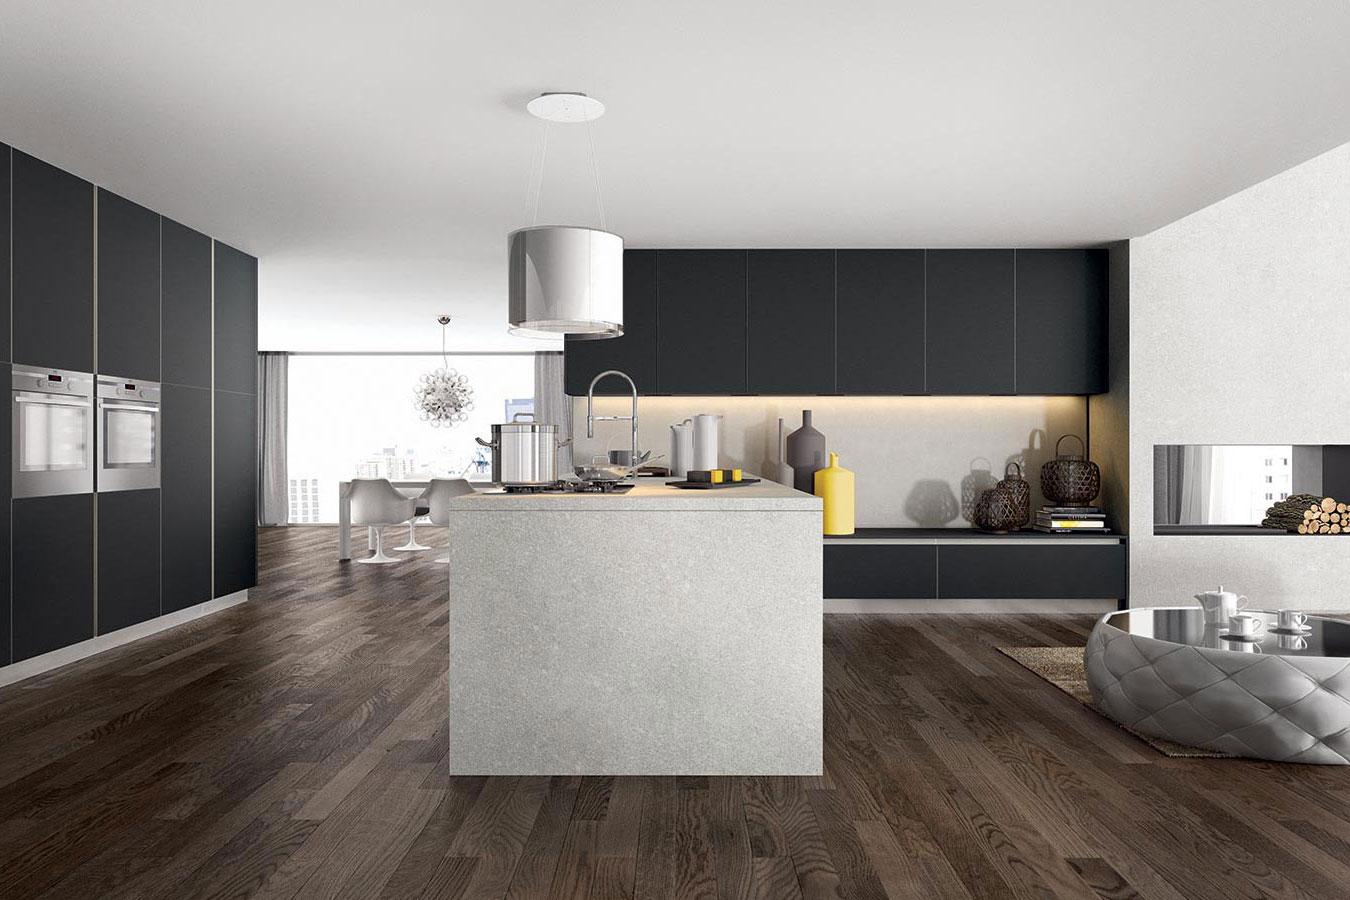 Cucine Bianco Grigio : Arredo cucina glass moderna design bianco grigio living isola